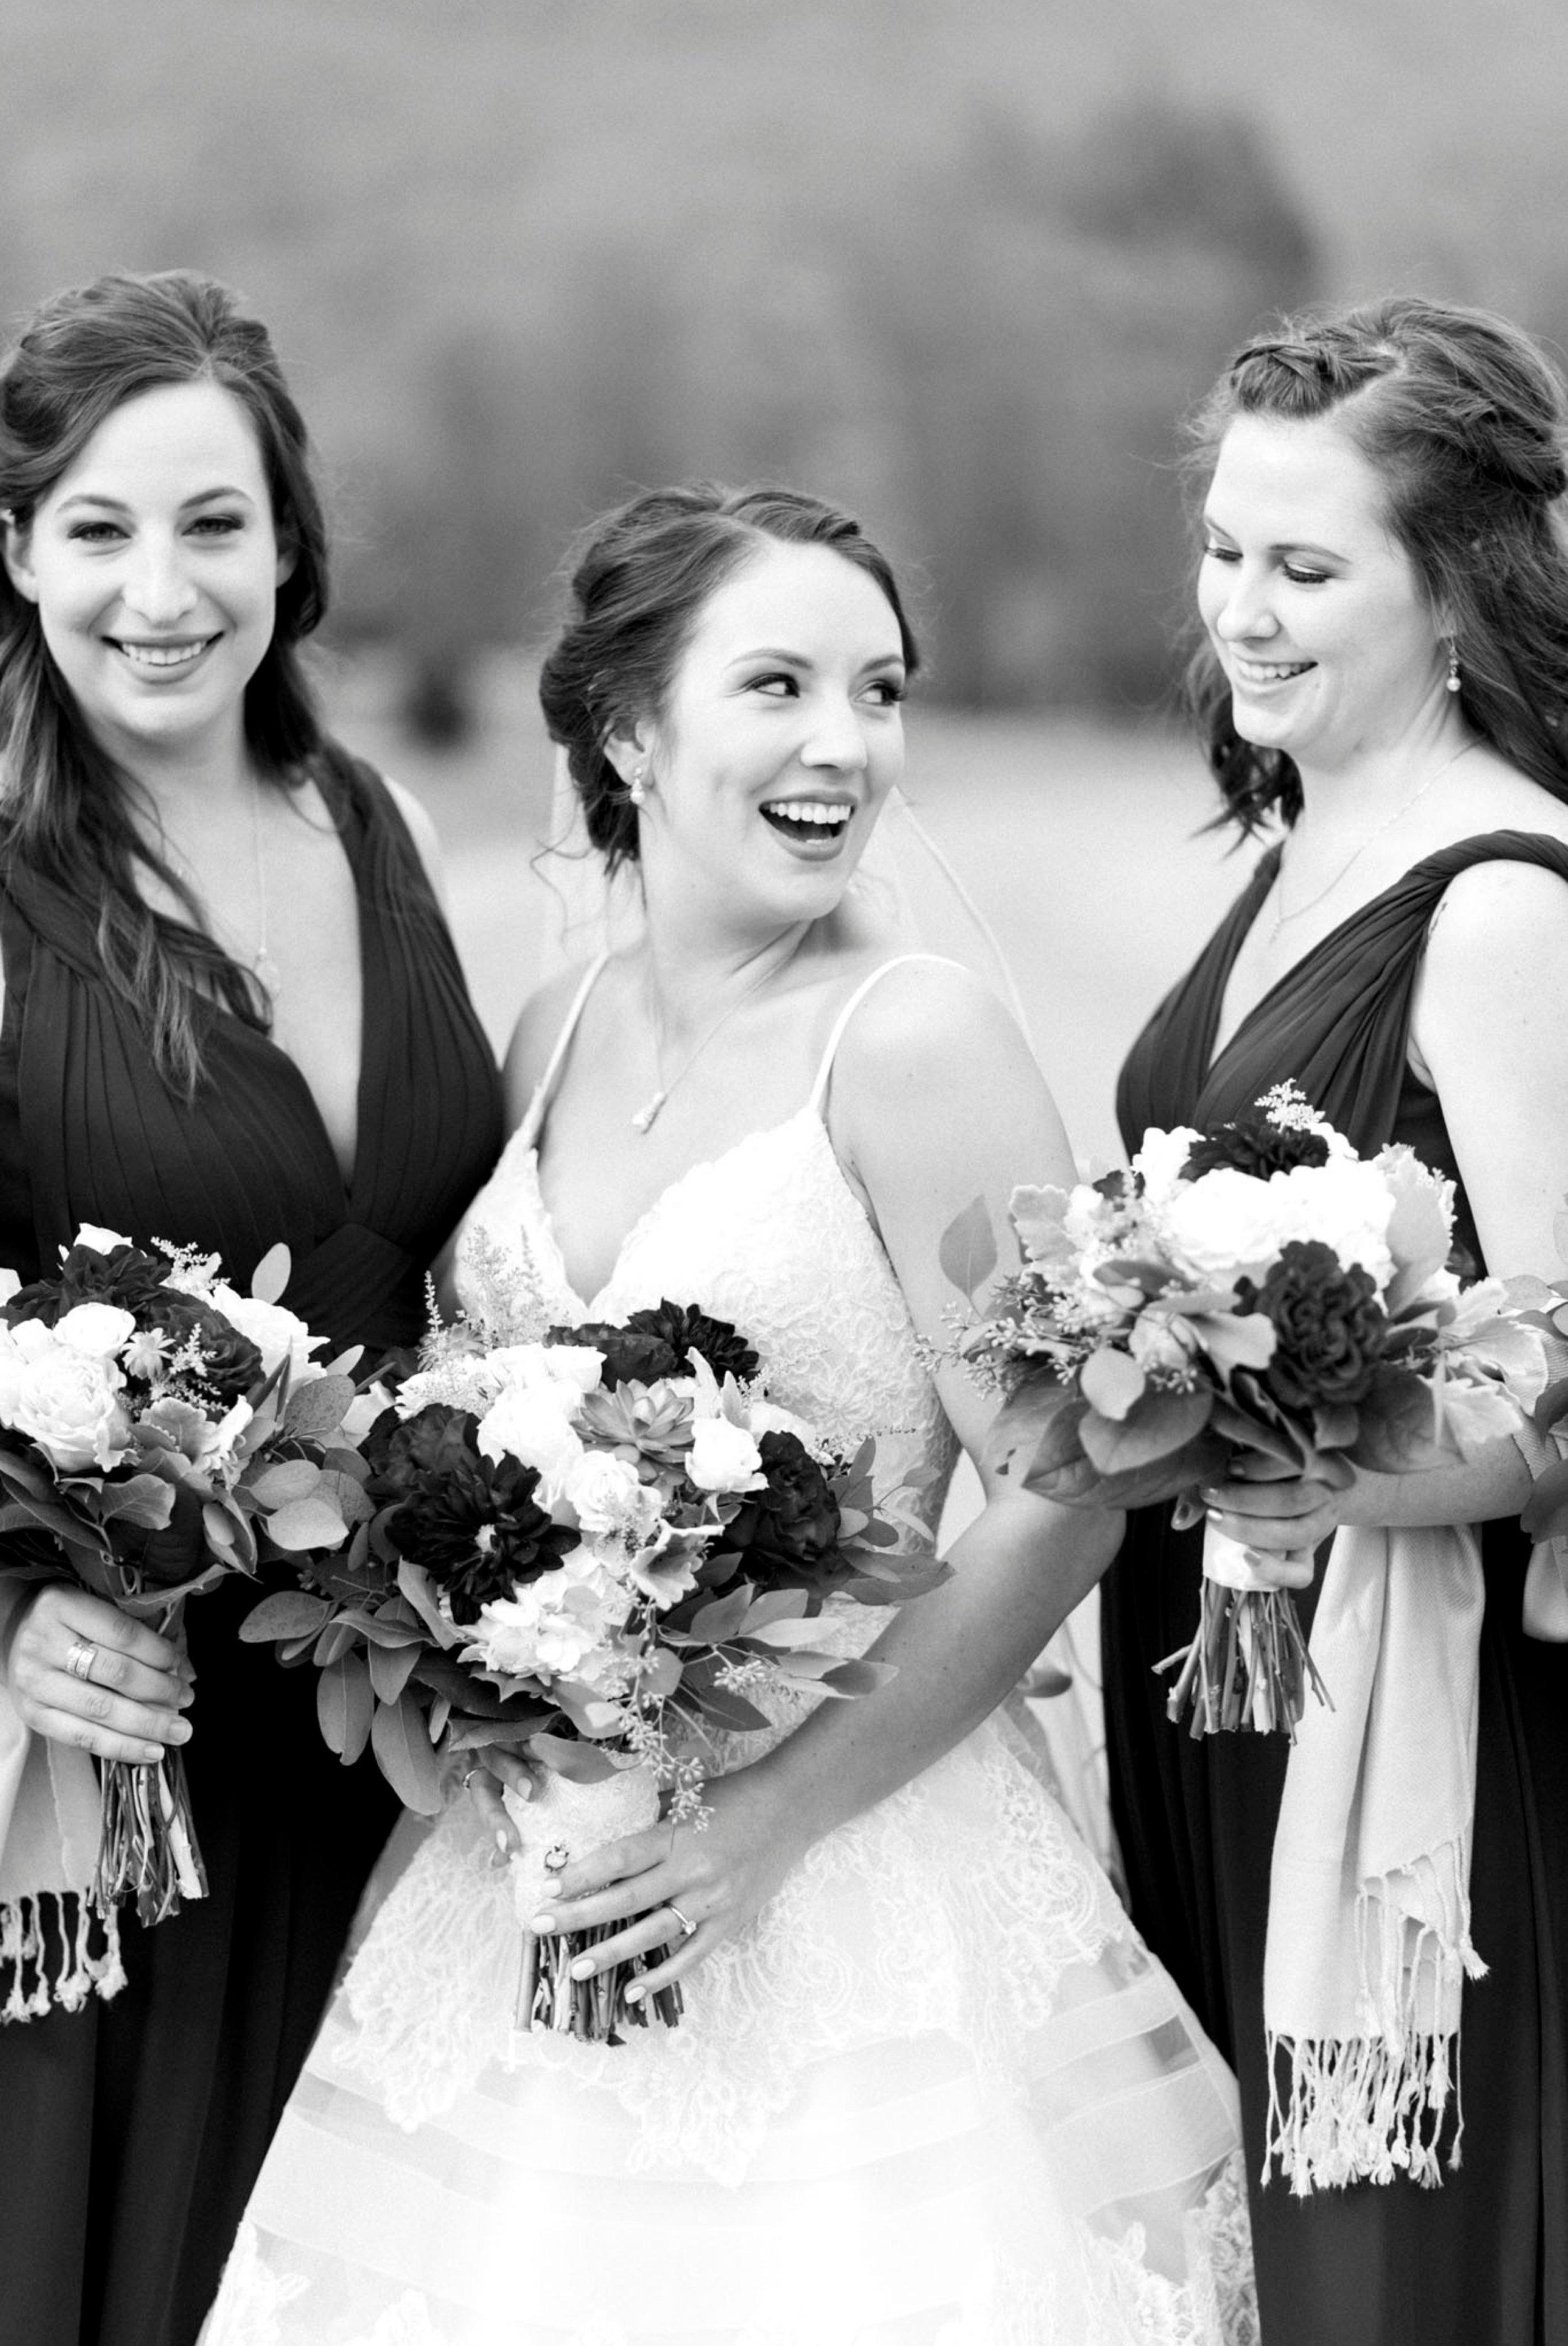 IrvineEstate_LexingtonVA_Wedding_FallWedding_VirginiaWeddingPhotographer 42.jpg